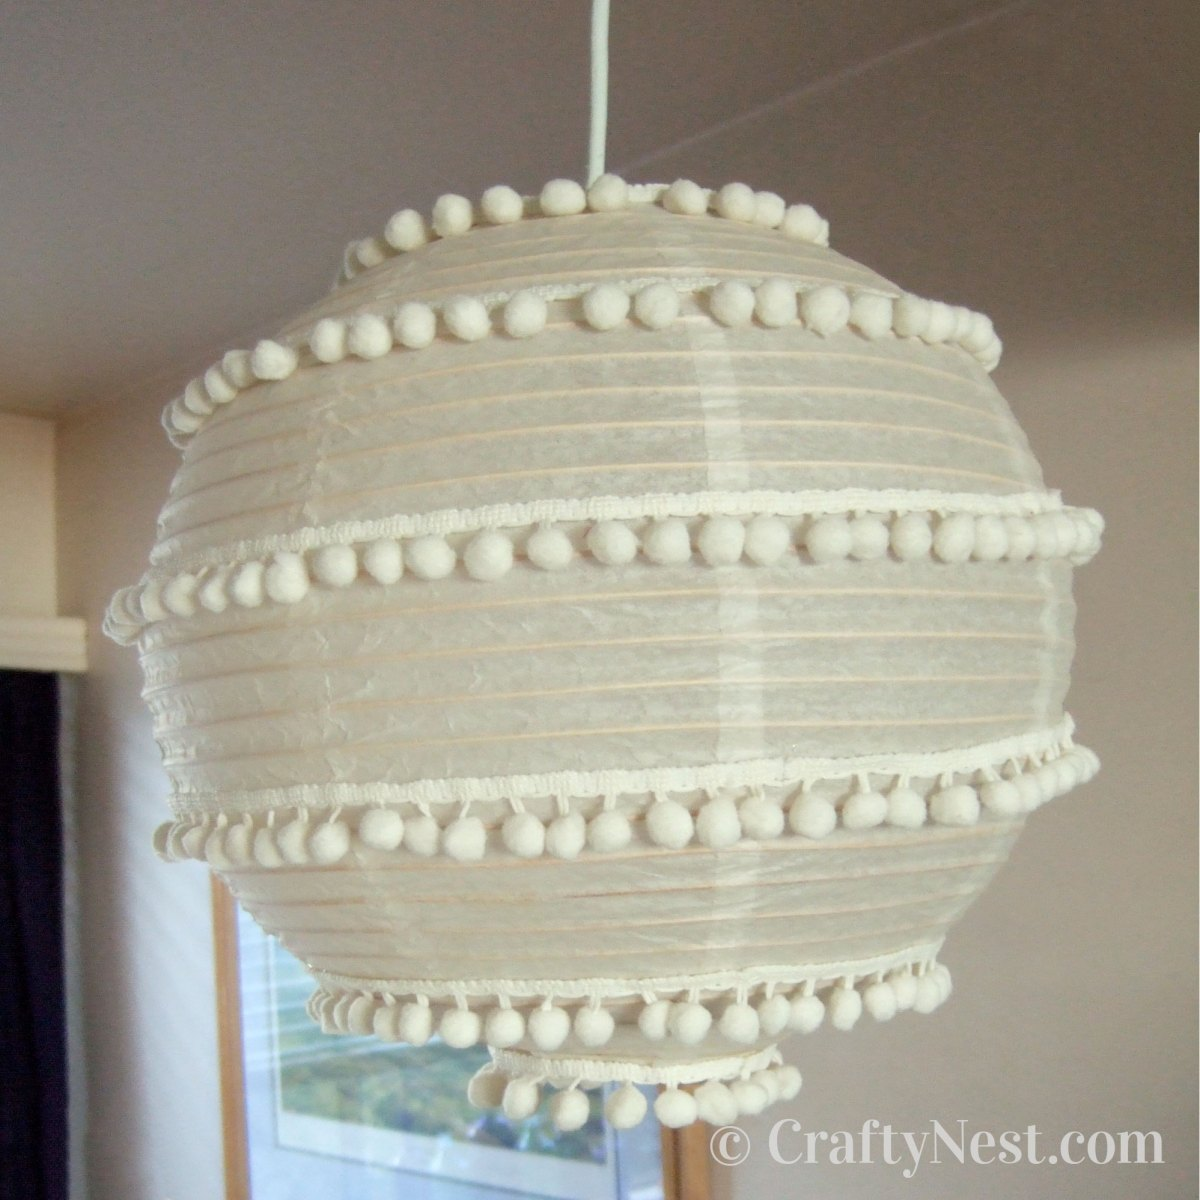 Hang the pom-pom lantern, photo